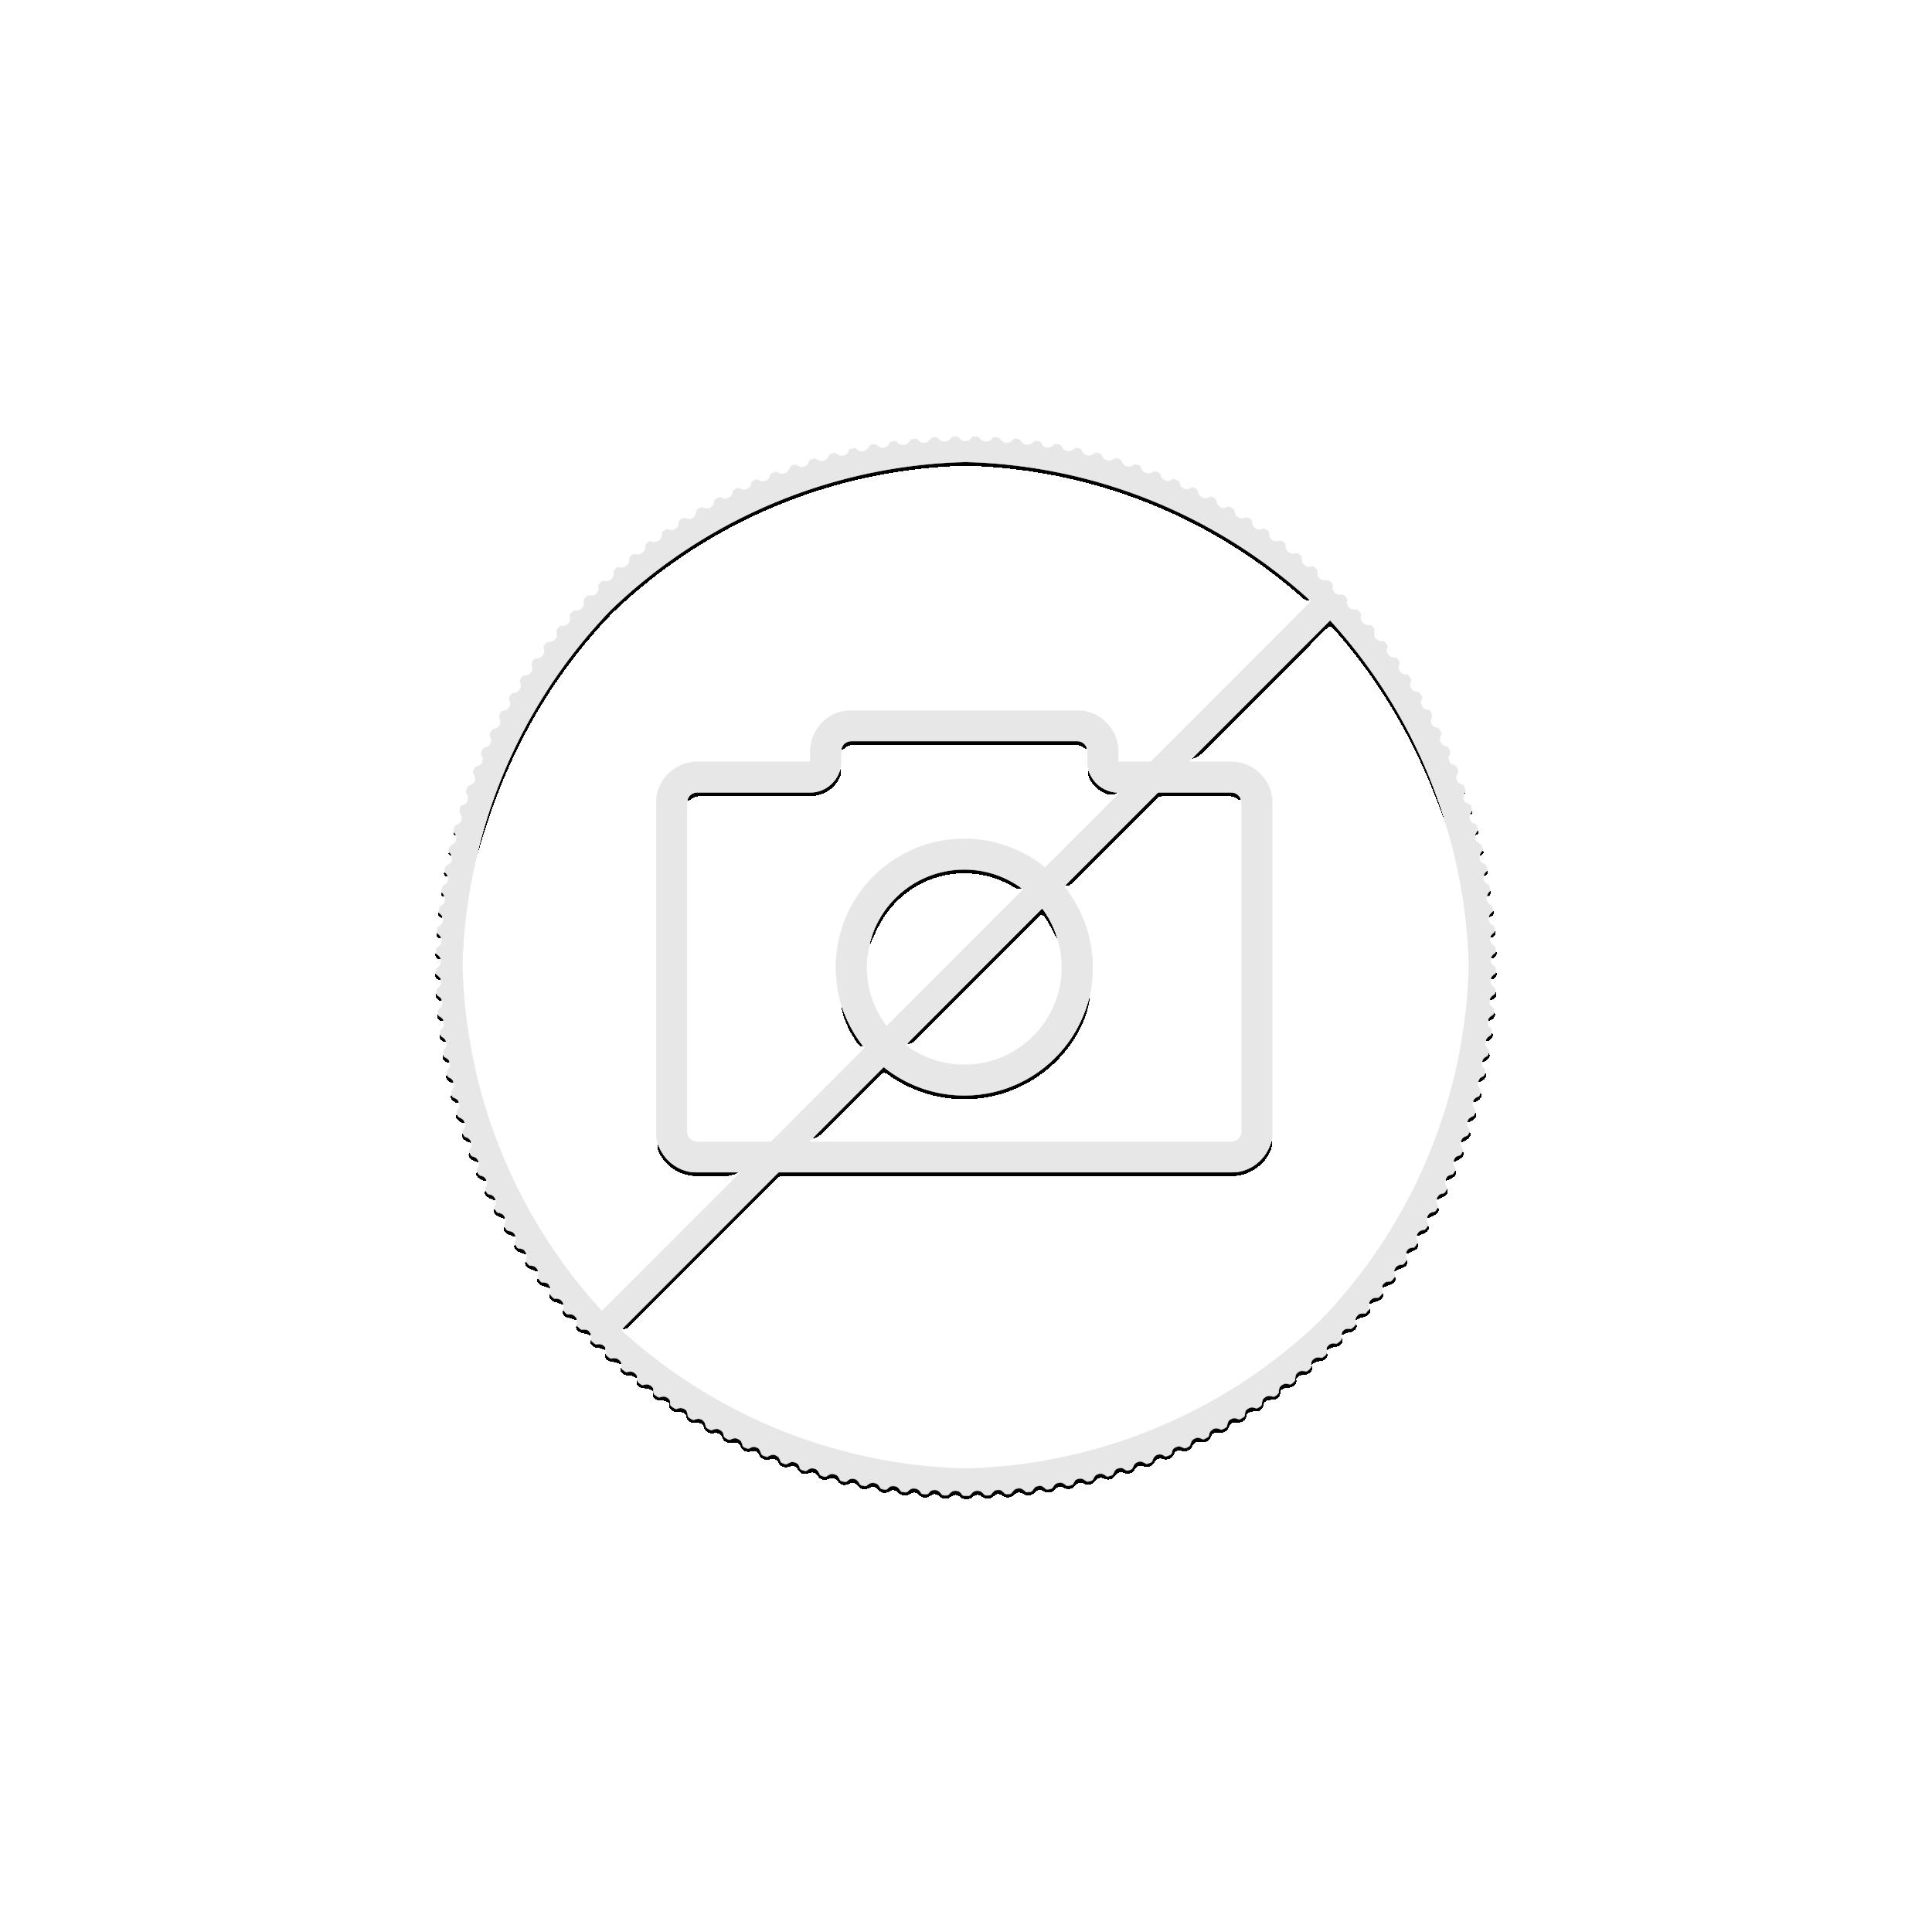 1 Troy ounce gold bar Perth Mint